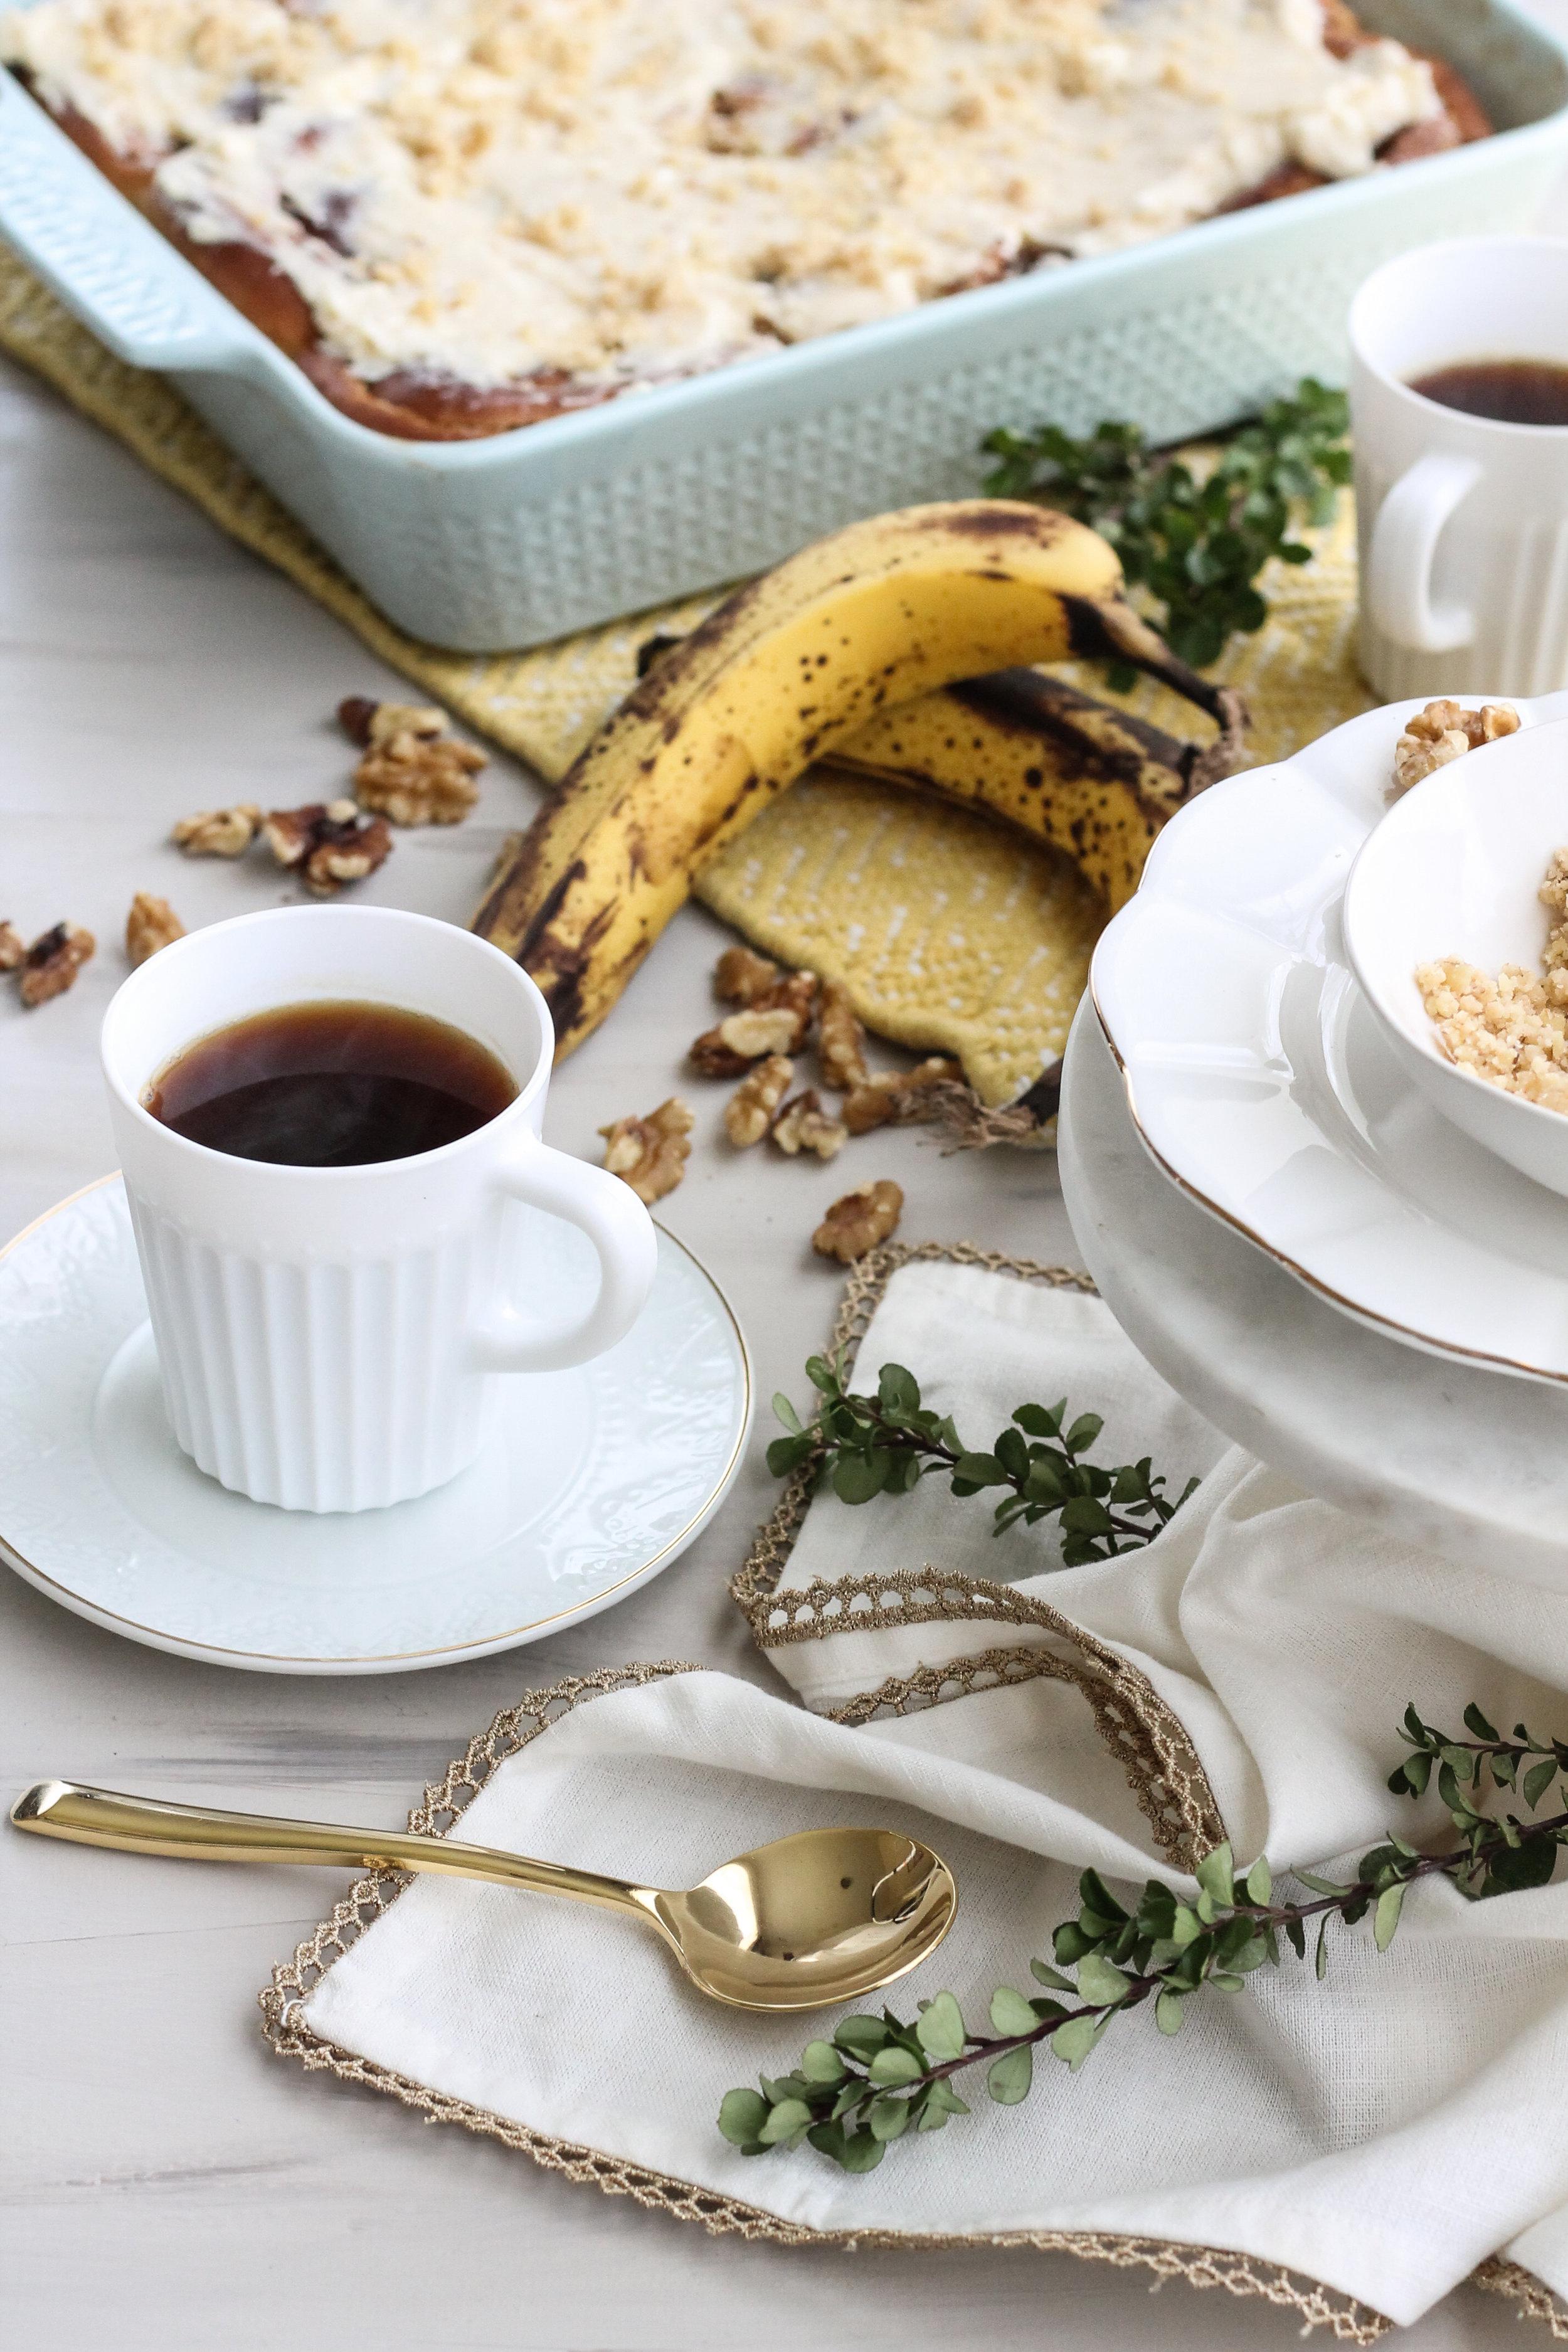 BANANA BREAD CINNAMON ROLLS WITH WALNUT PRALINE WILL CHANGE YOUR LIFE [ www.pedanticfoodie.com ]